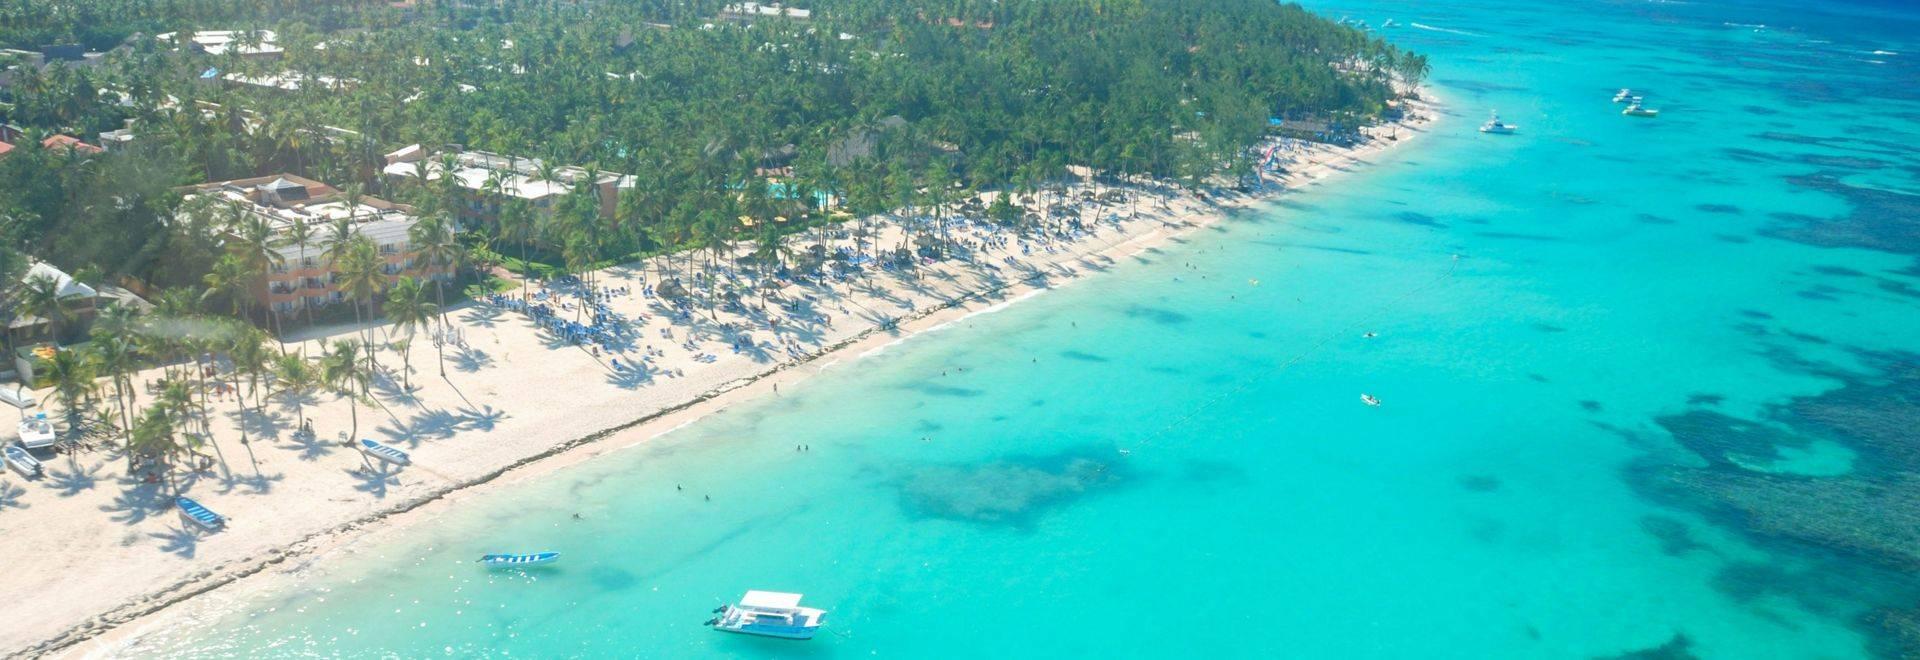 Dominican Republic - Stunning coastline.jpg